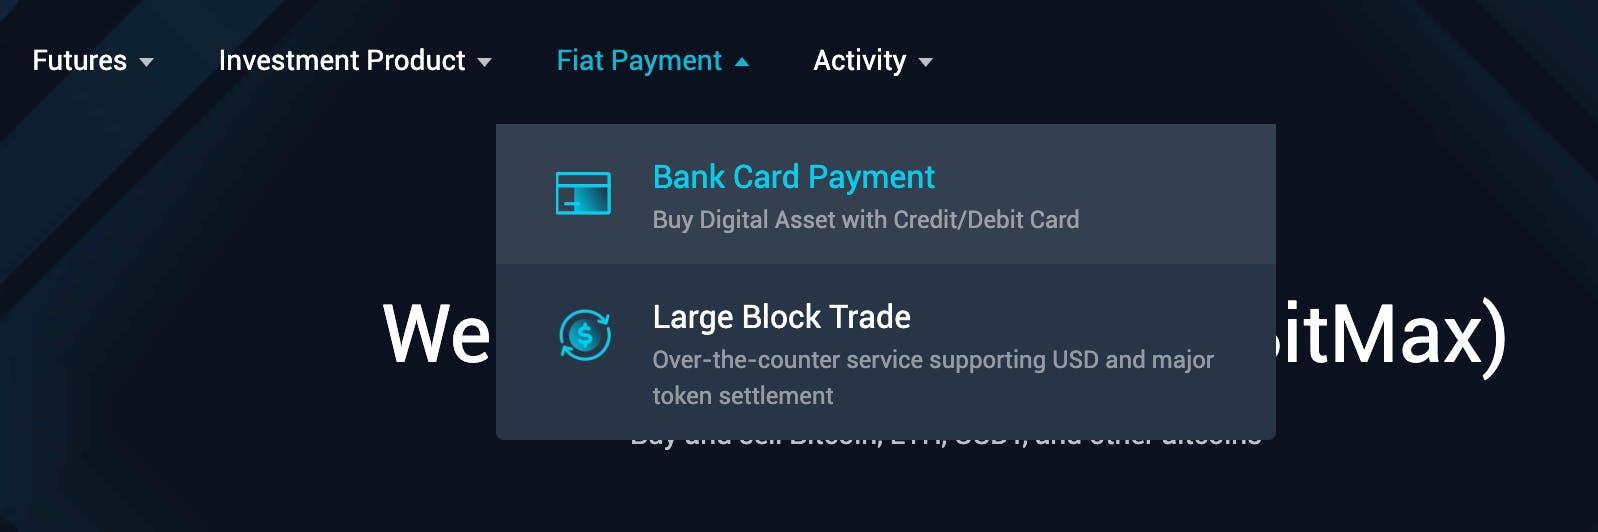 Buy digital assets with credit/debit card